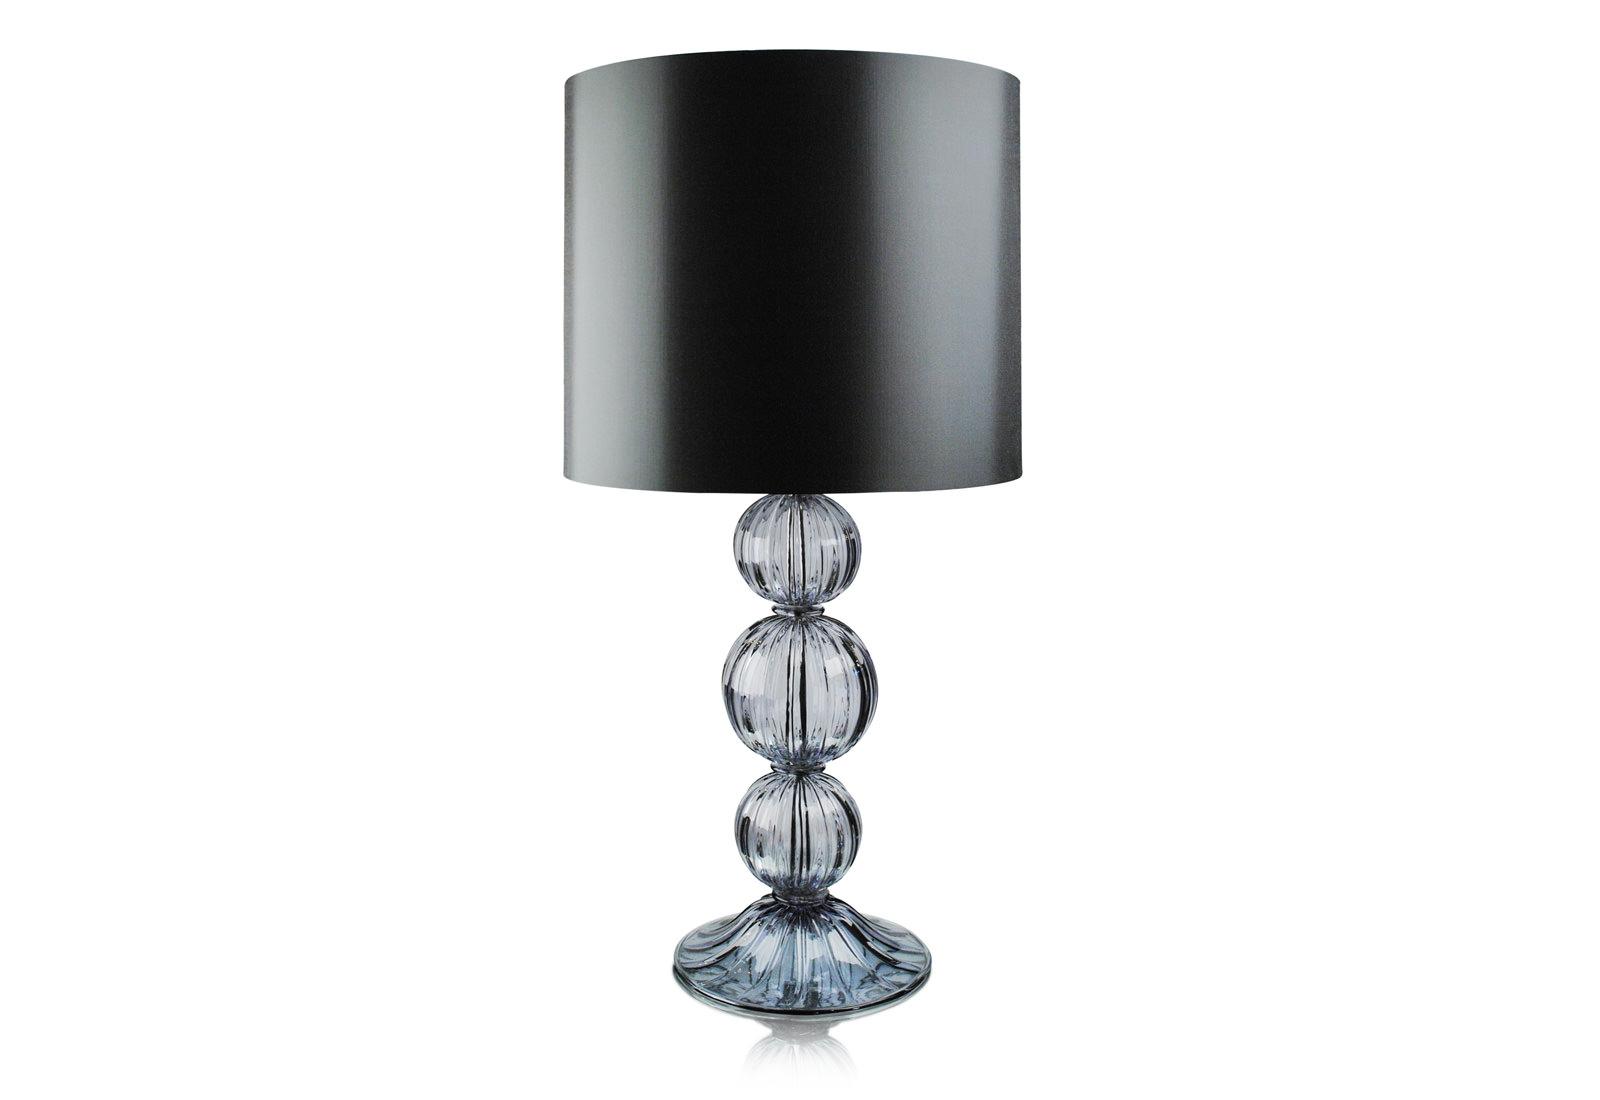 Joya villaverde london villaverde london joya murano table lamp 2 aloadofball Gallery